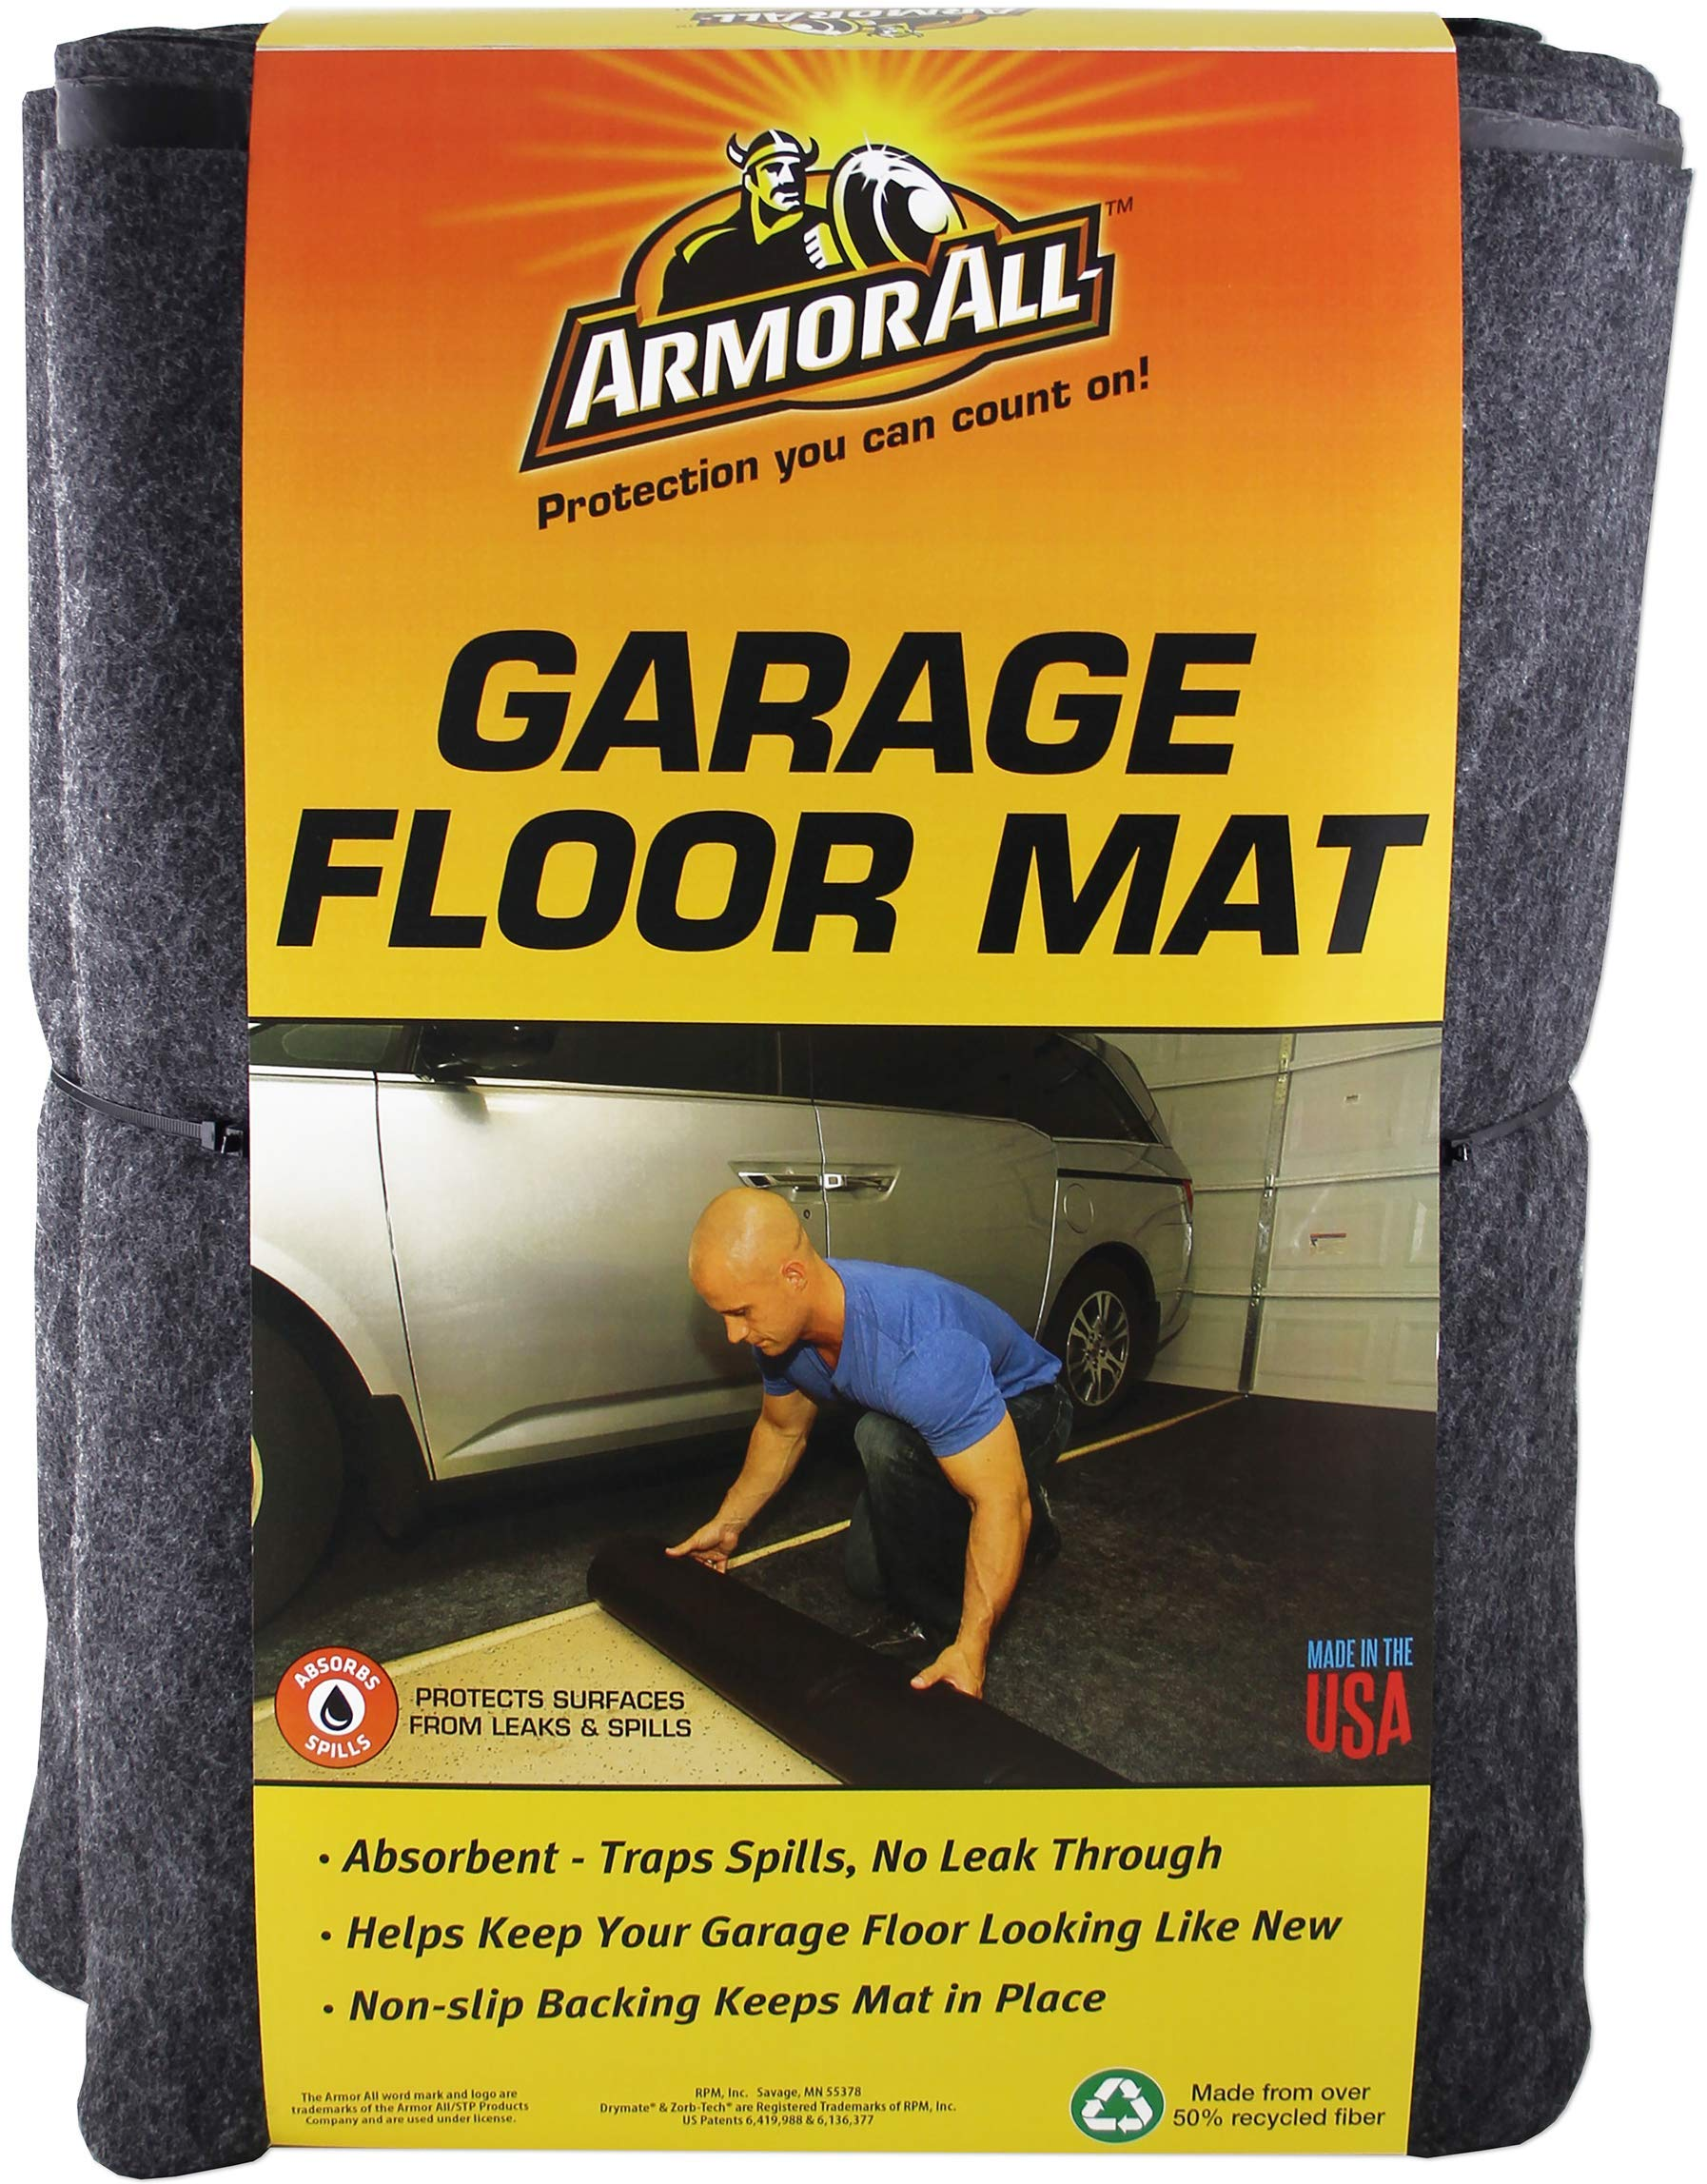 Armor All AAGFMC22 Garage Floor Mat 22' x 8'10'' (X-Large Charcoal) (Renewed)